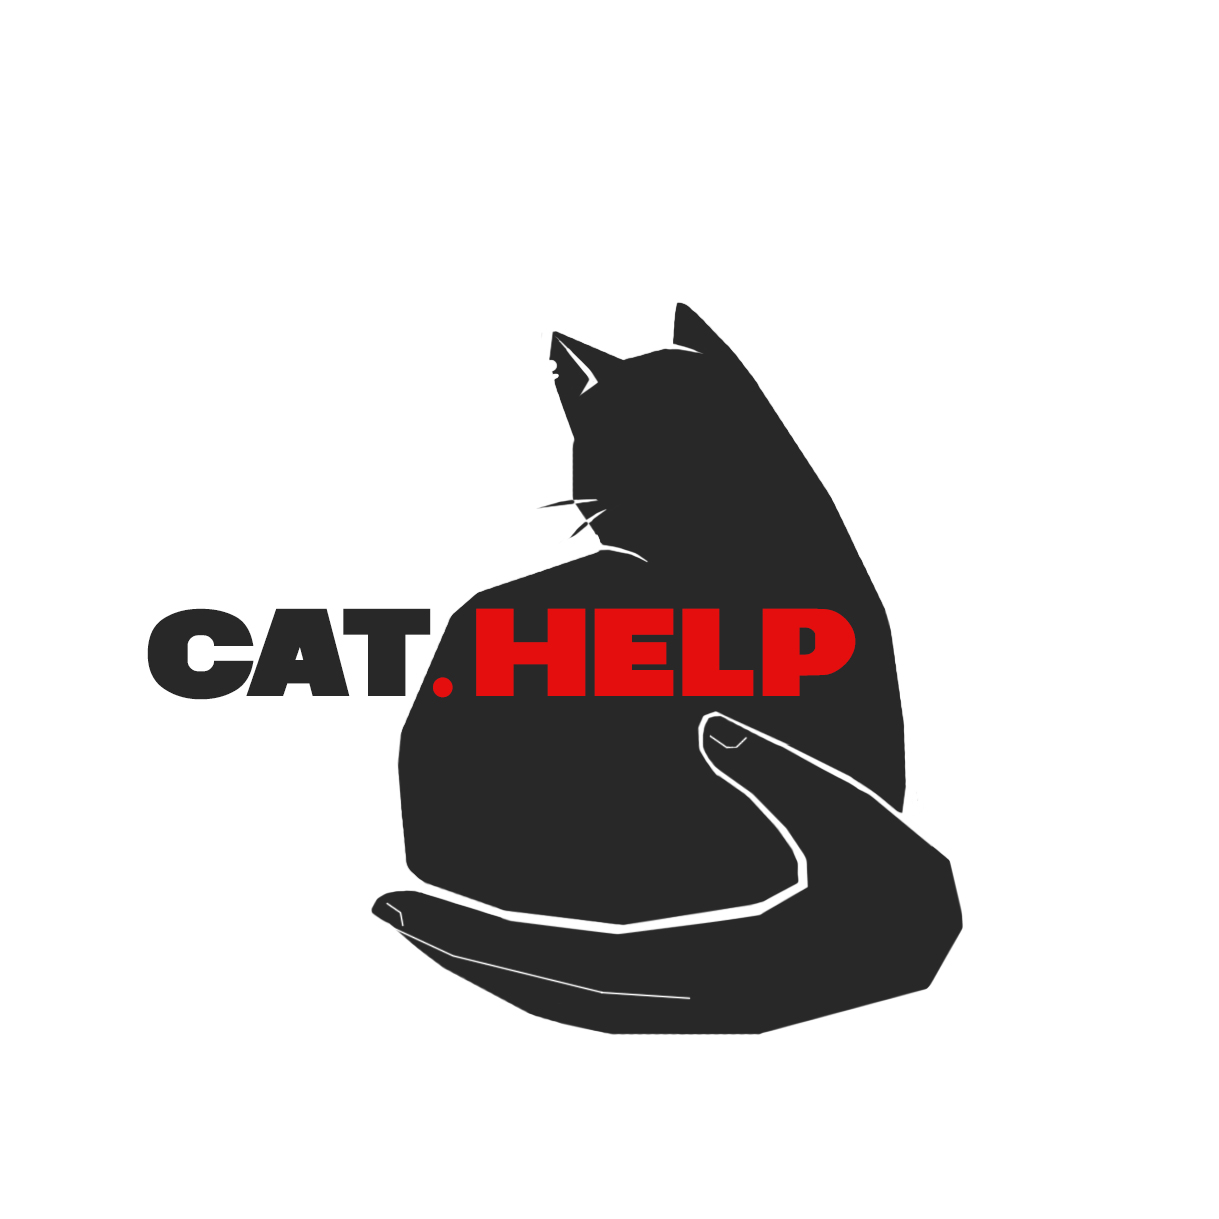 логотип для сайта и группы вк - cat.help фото f_45959da9cdd8db29.jpg